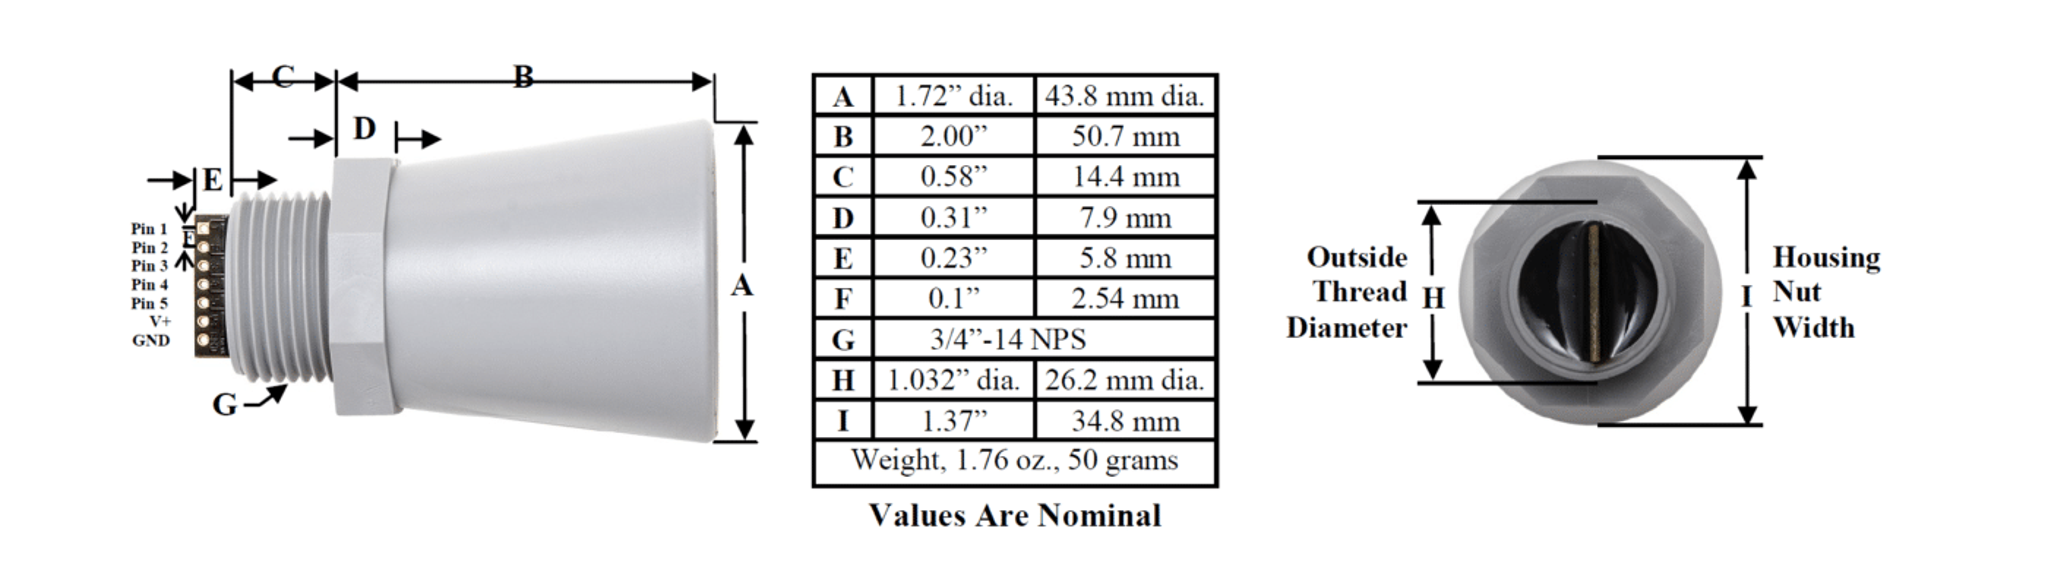 MB7389 Ultrasonic Distance Sensor dimensions